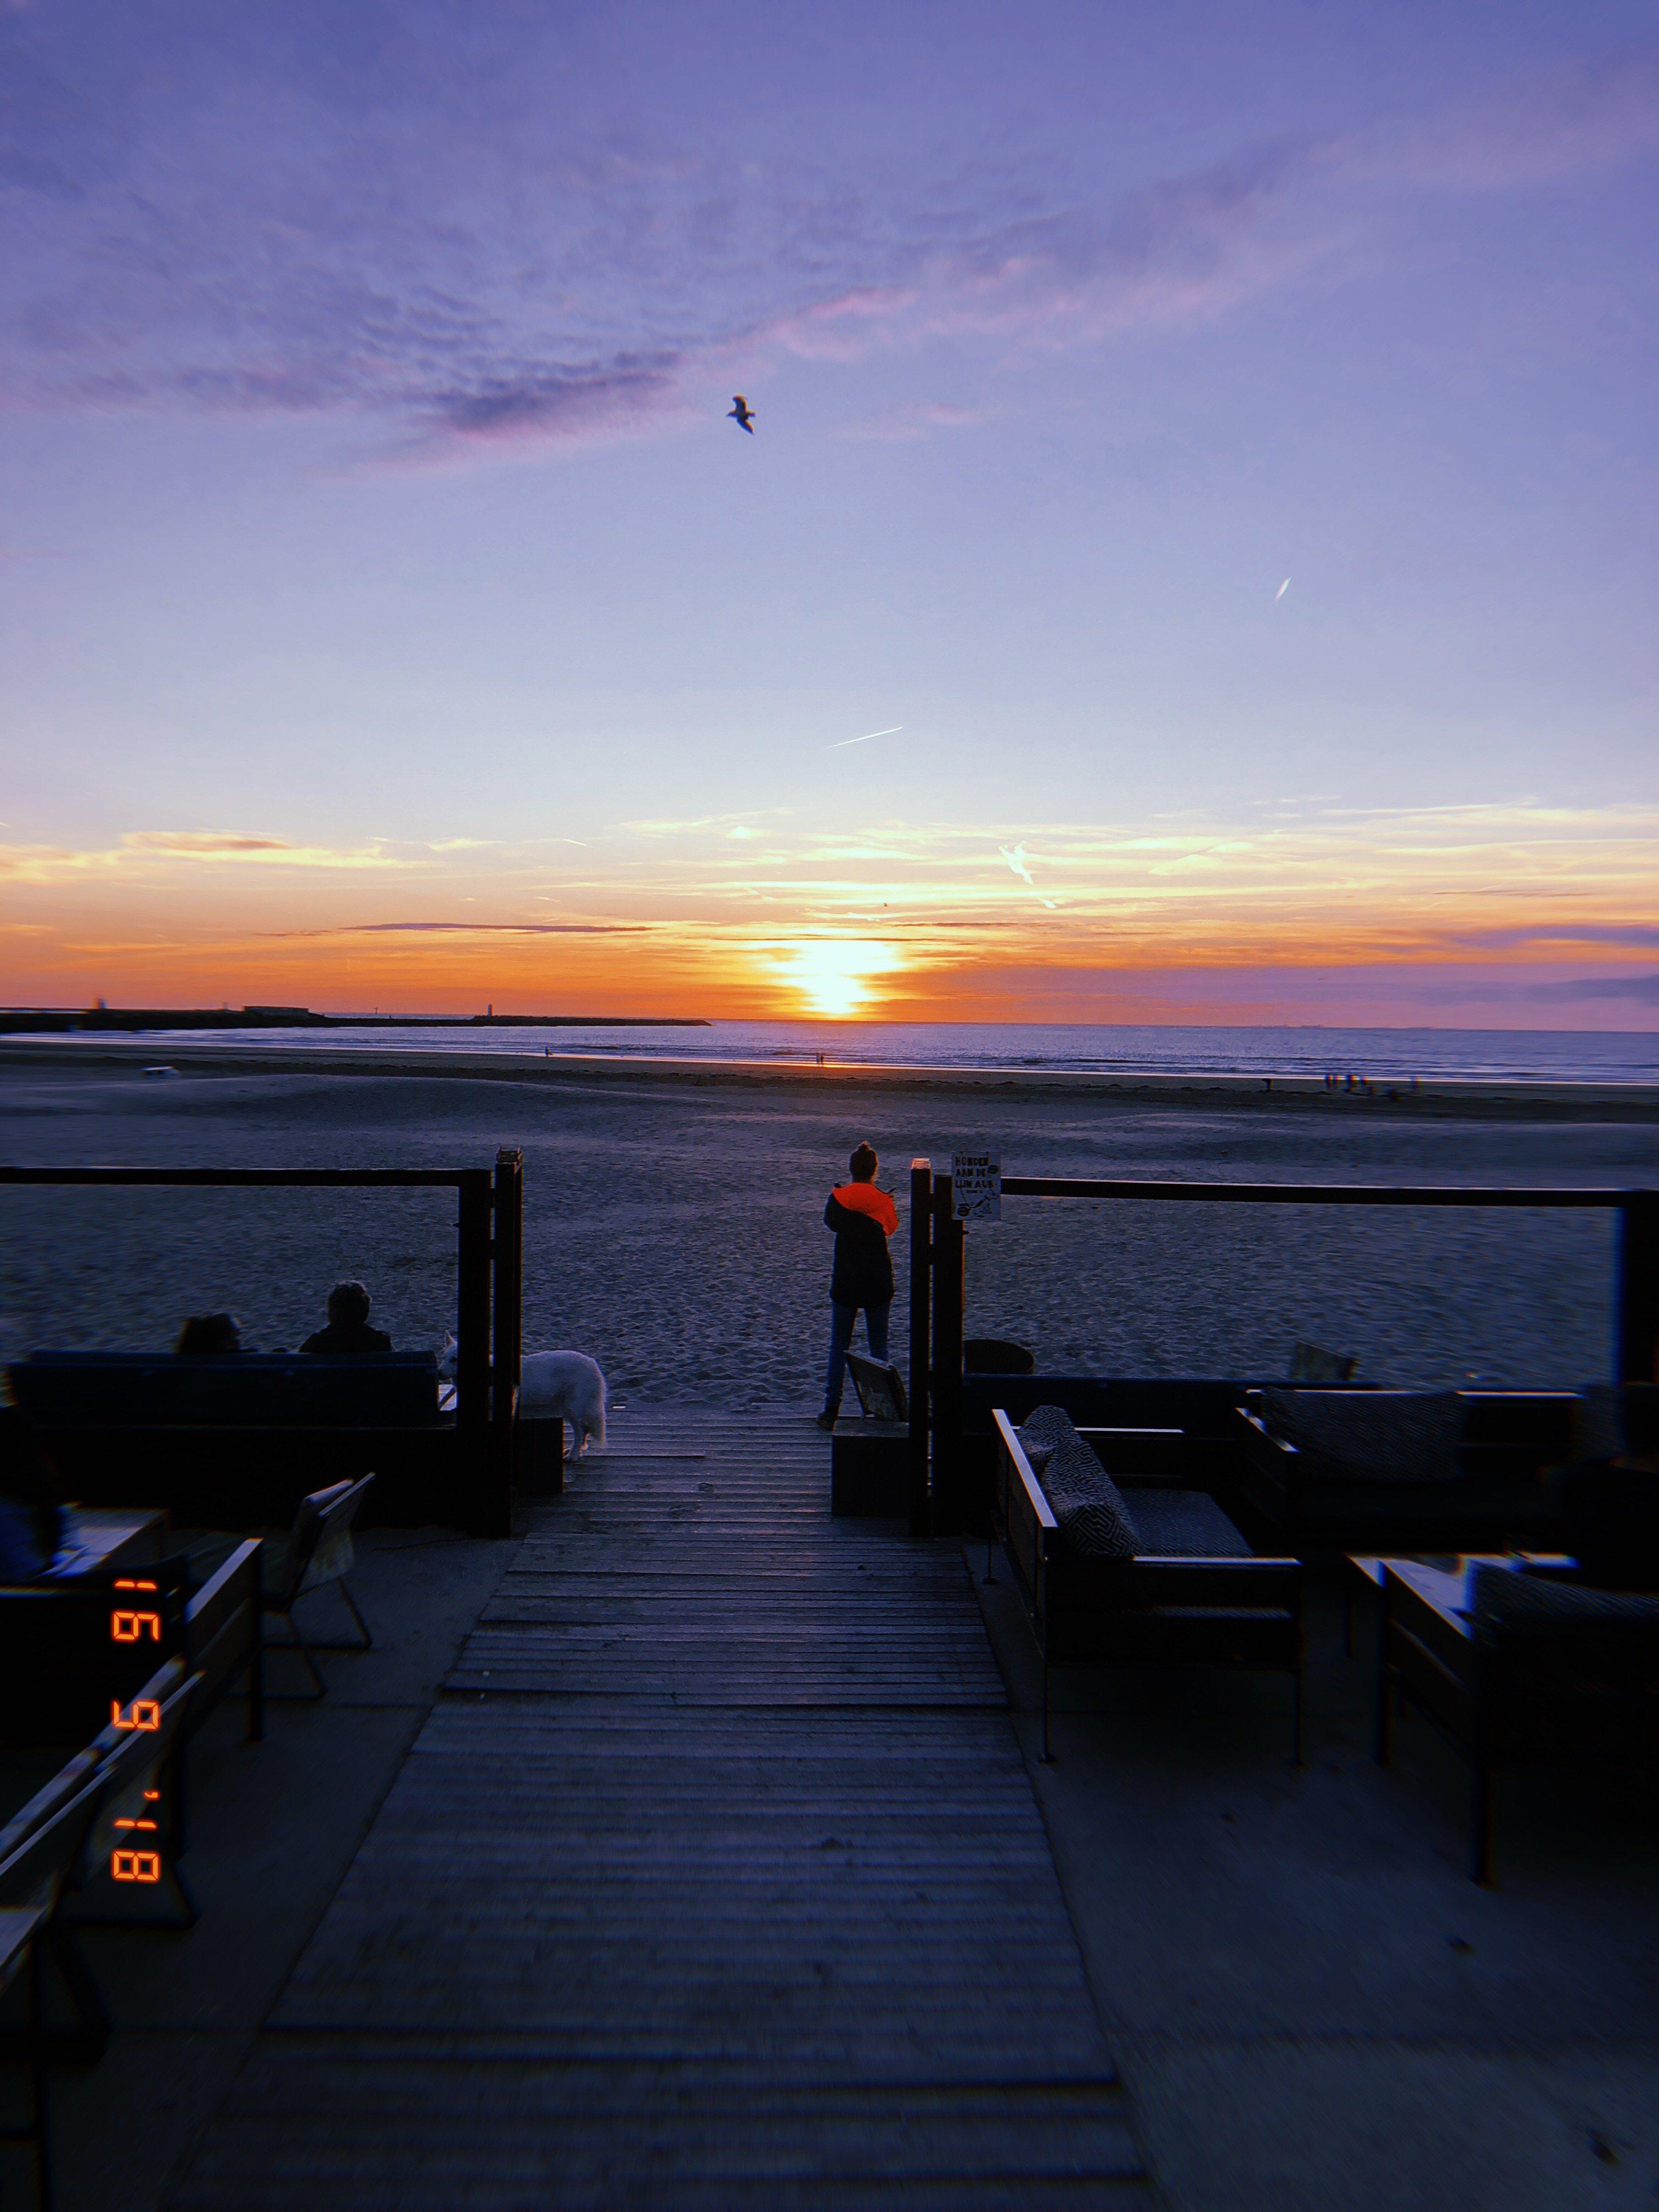 Beach Sunset At Ijmuiden Strand A Day In The Dutch Dunes Aloha Beach